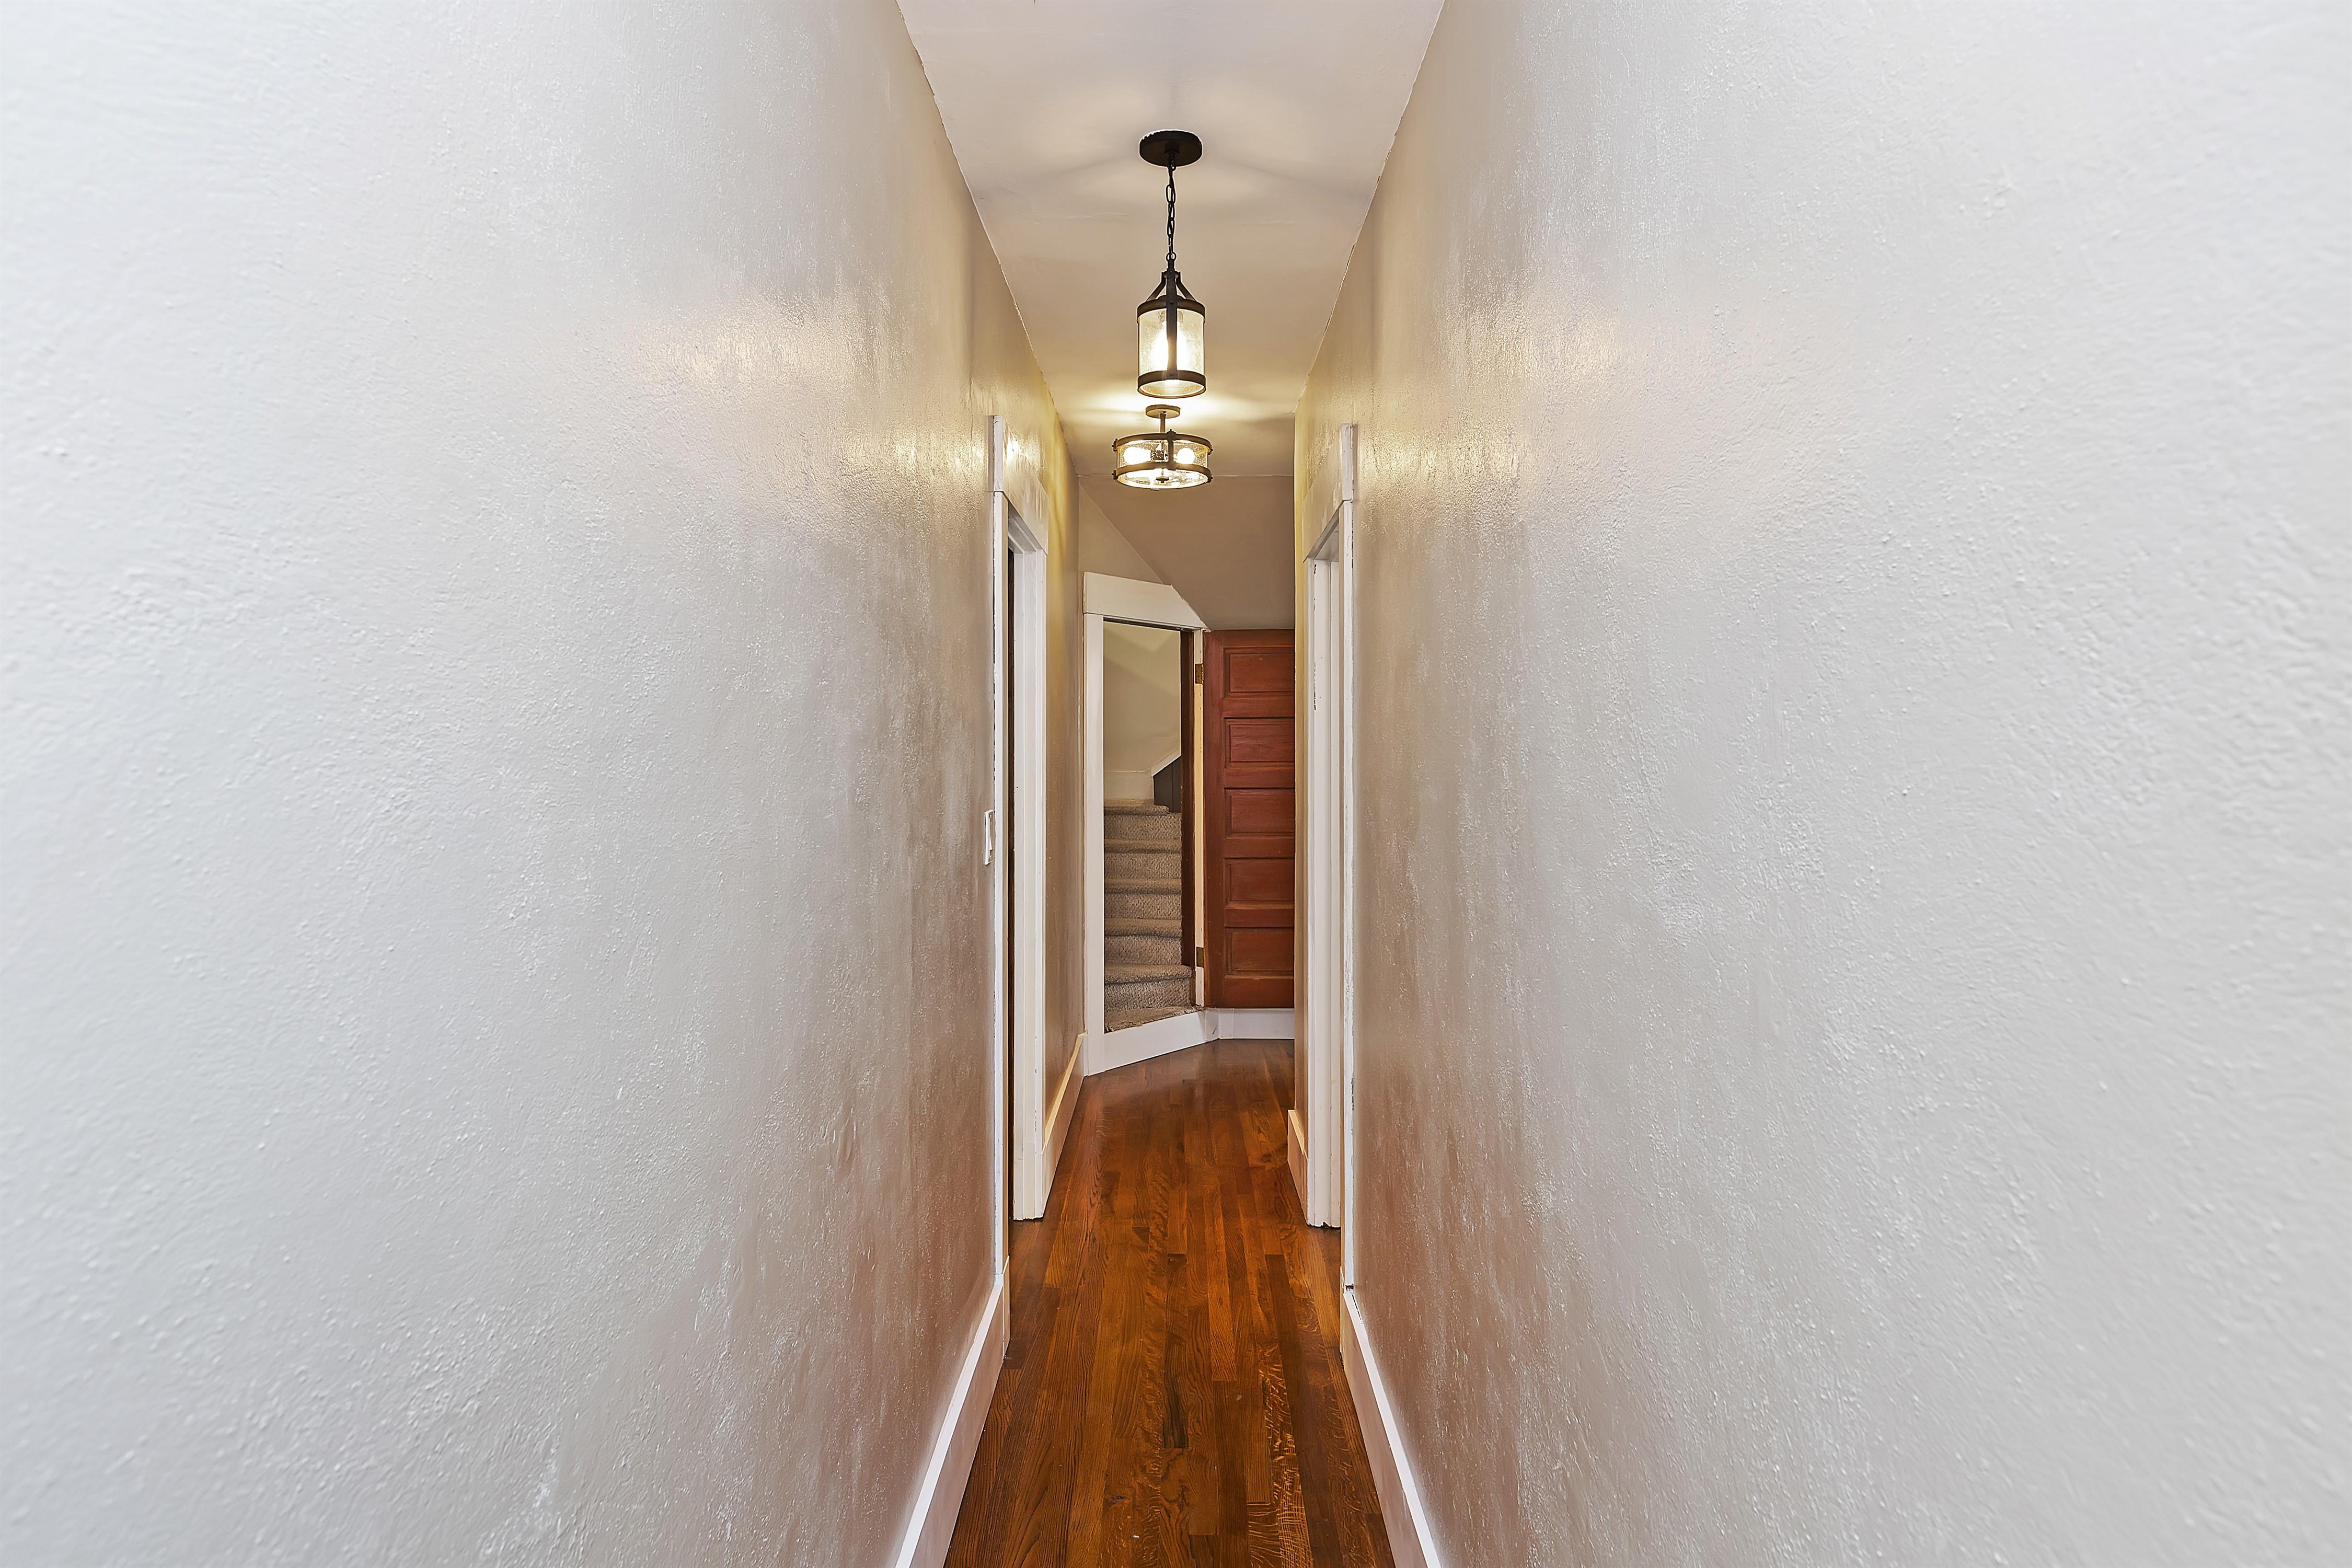 022_Hallway